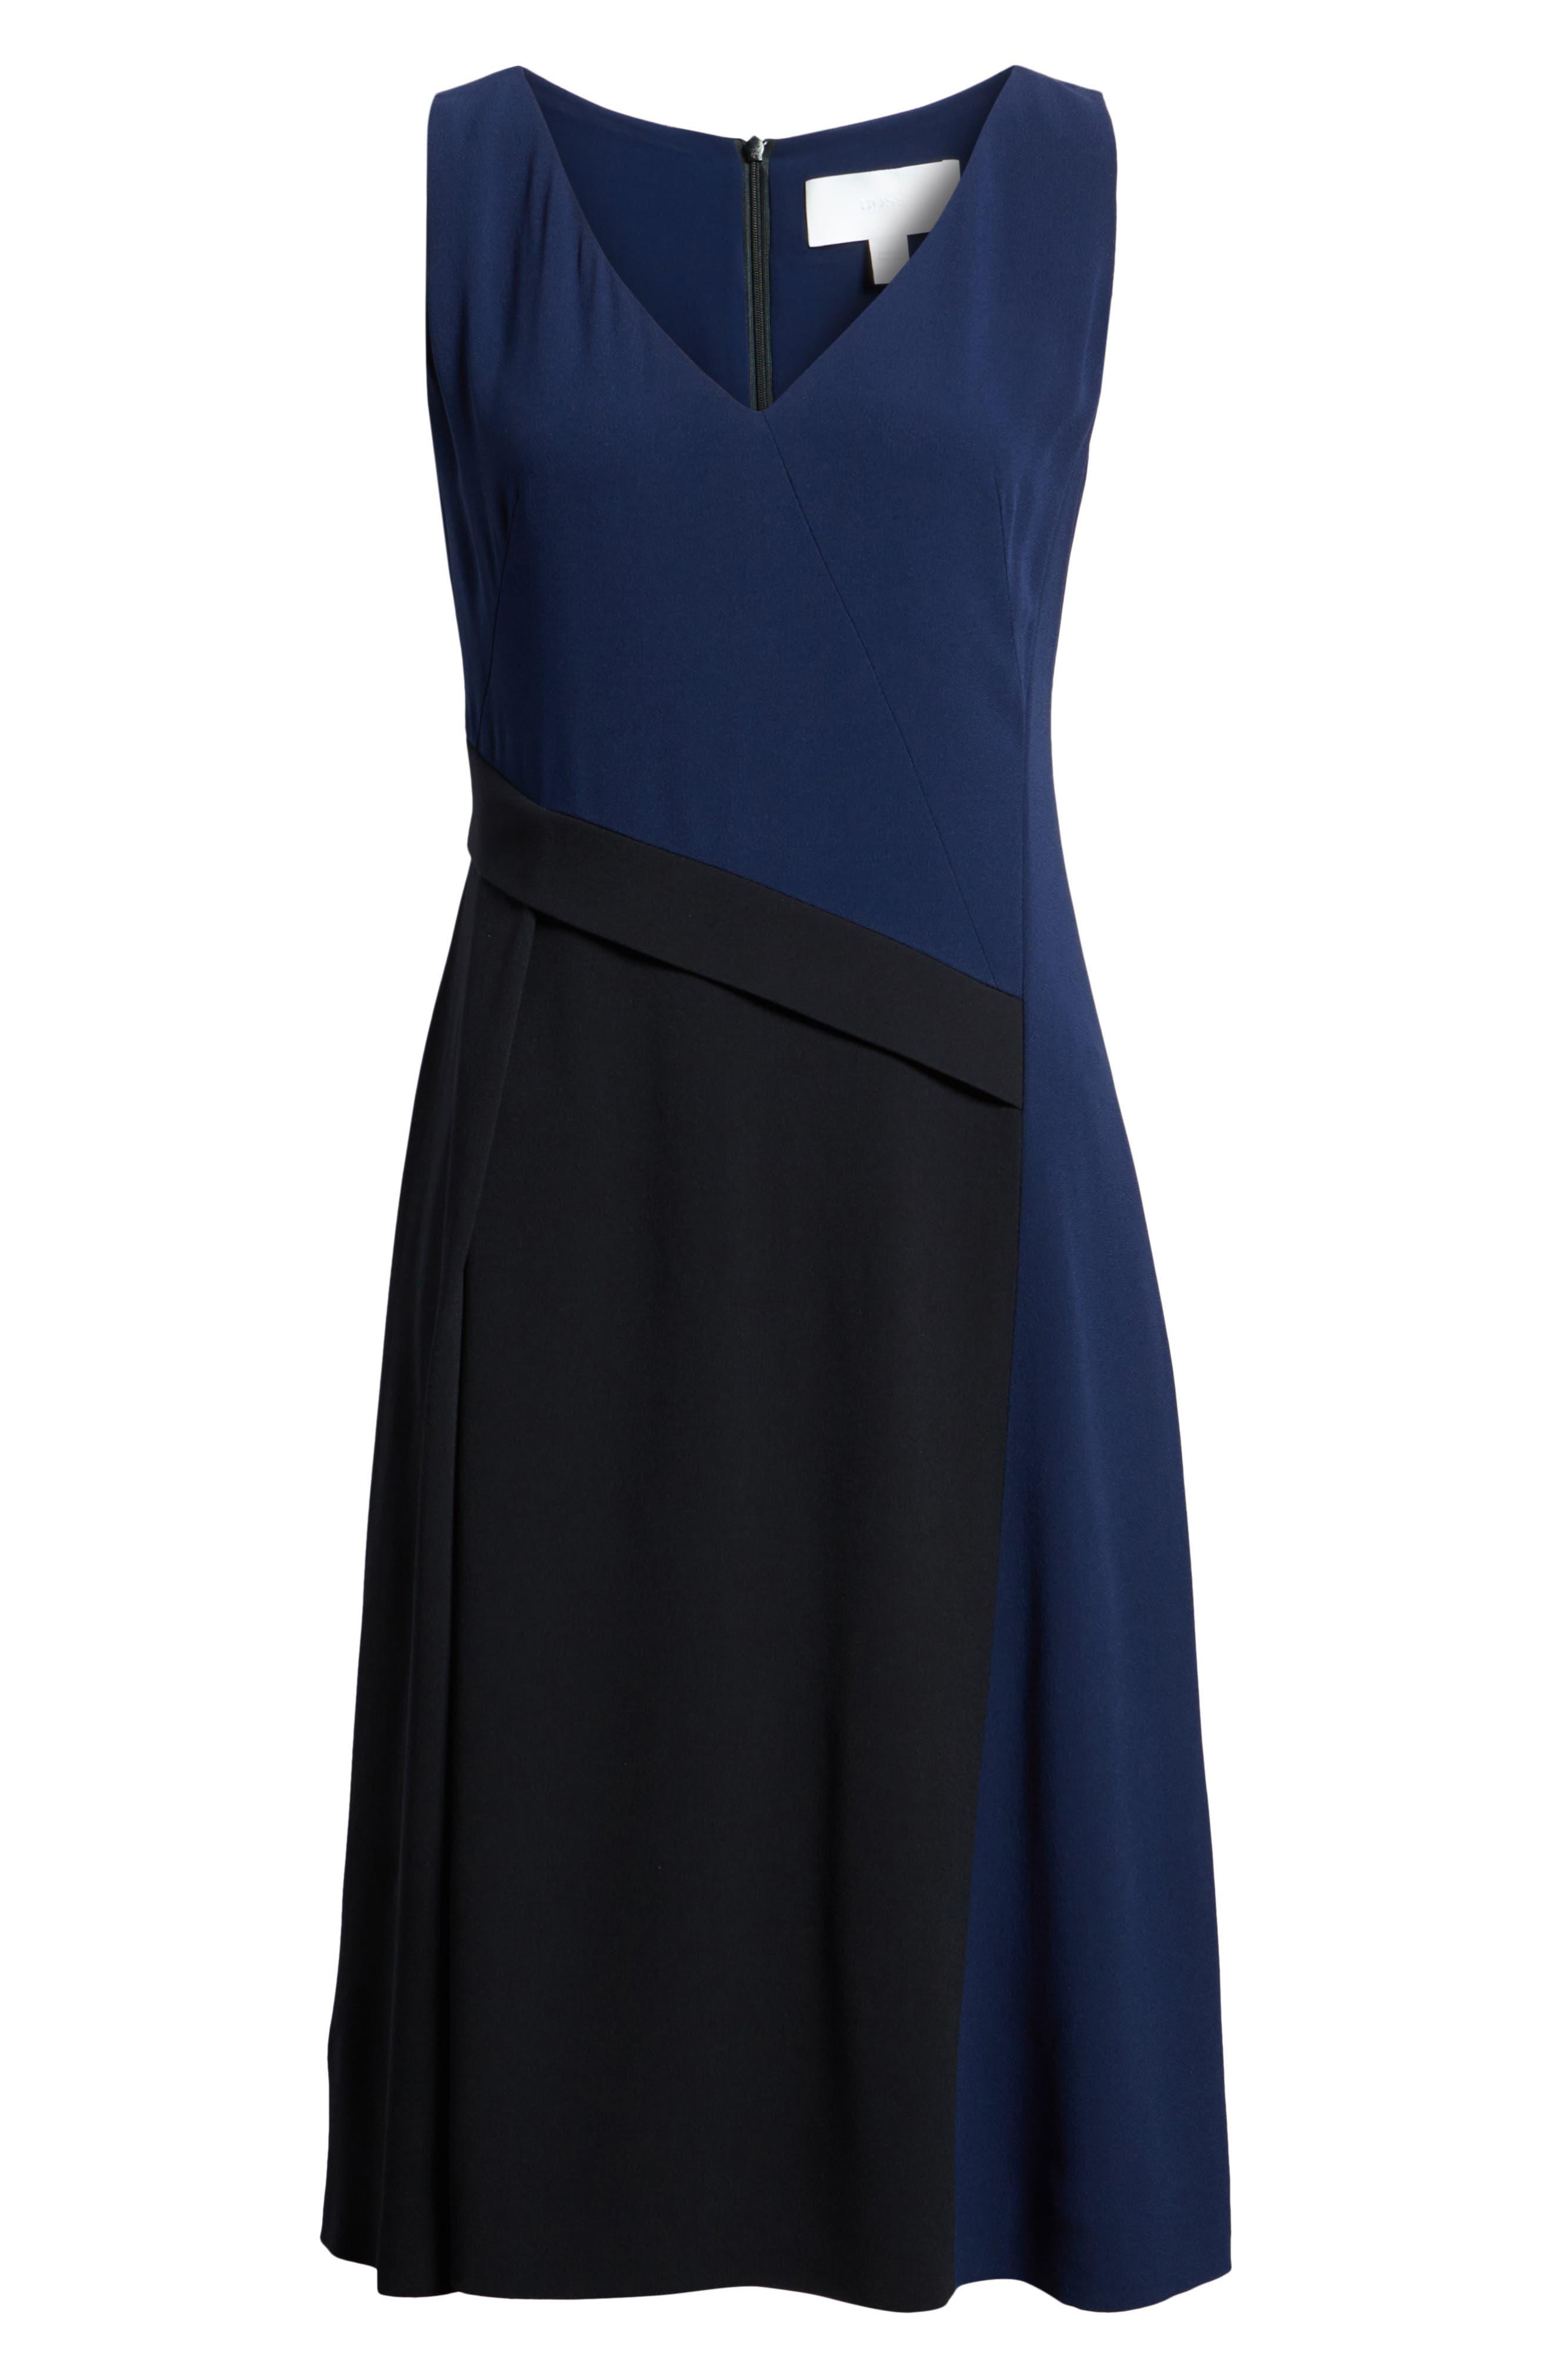 Demana A-Line Dress,                             Alternate thumbnail 6, color,                             Black